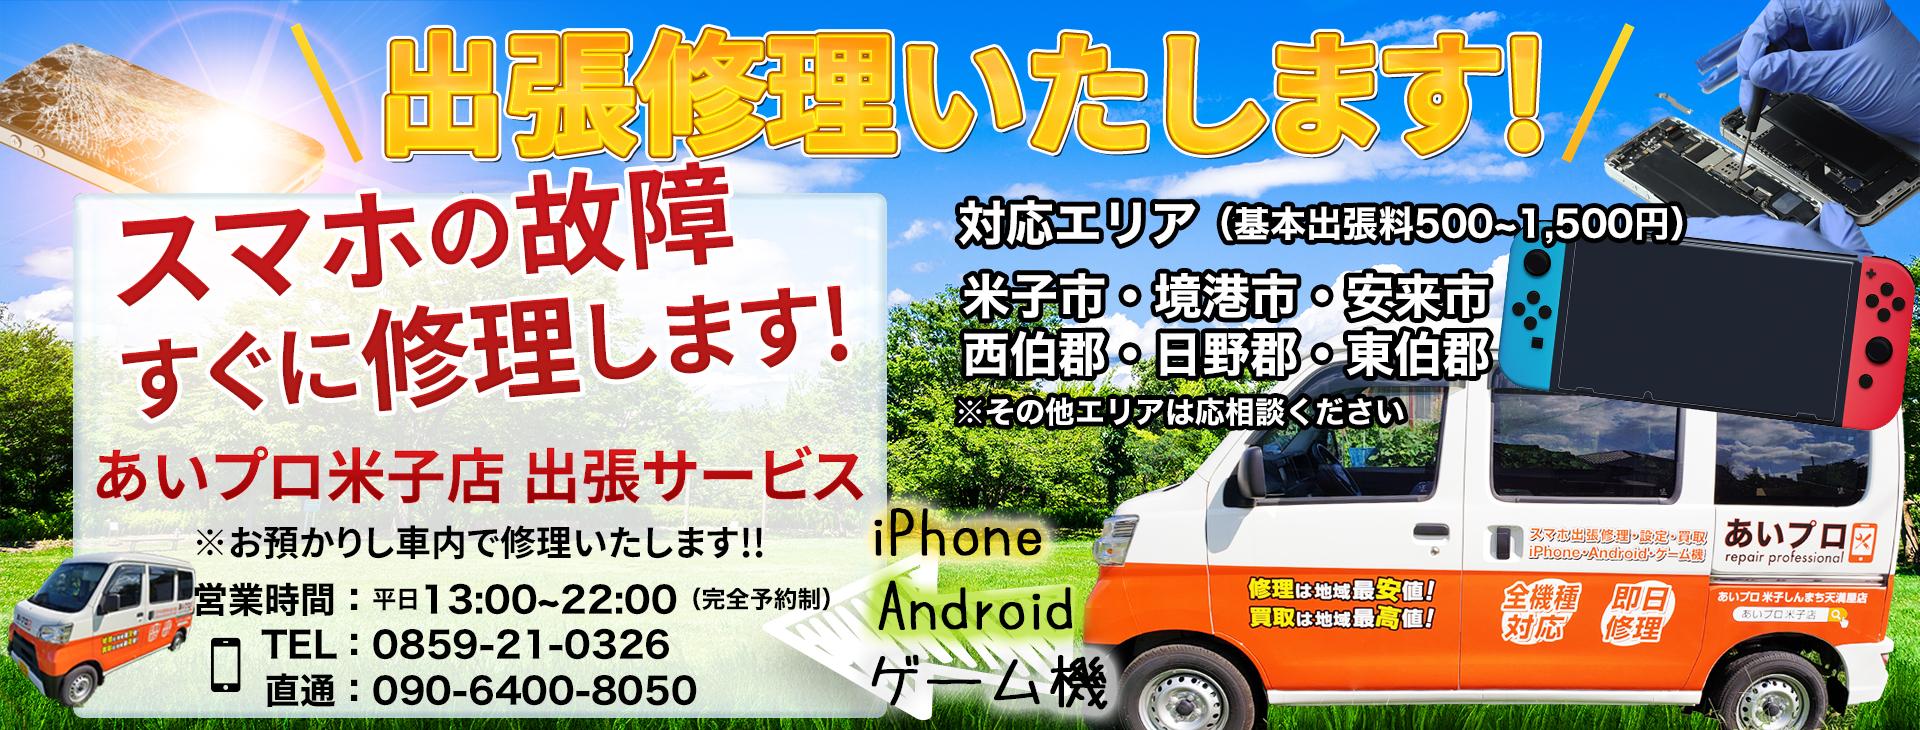 iPhone・スマホ・ゲーム機修理専門店「あいプロ米子店」出張修理も対応します!!米子市/安来市/境港市/西伯郡・・・